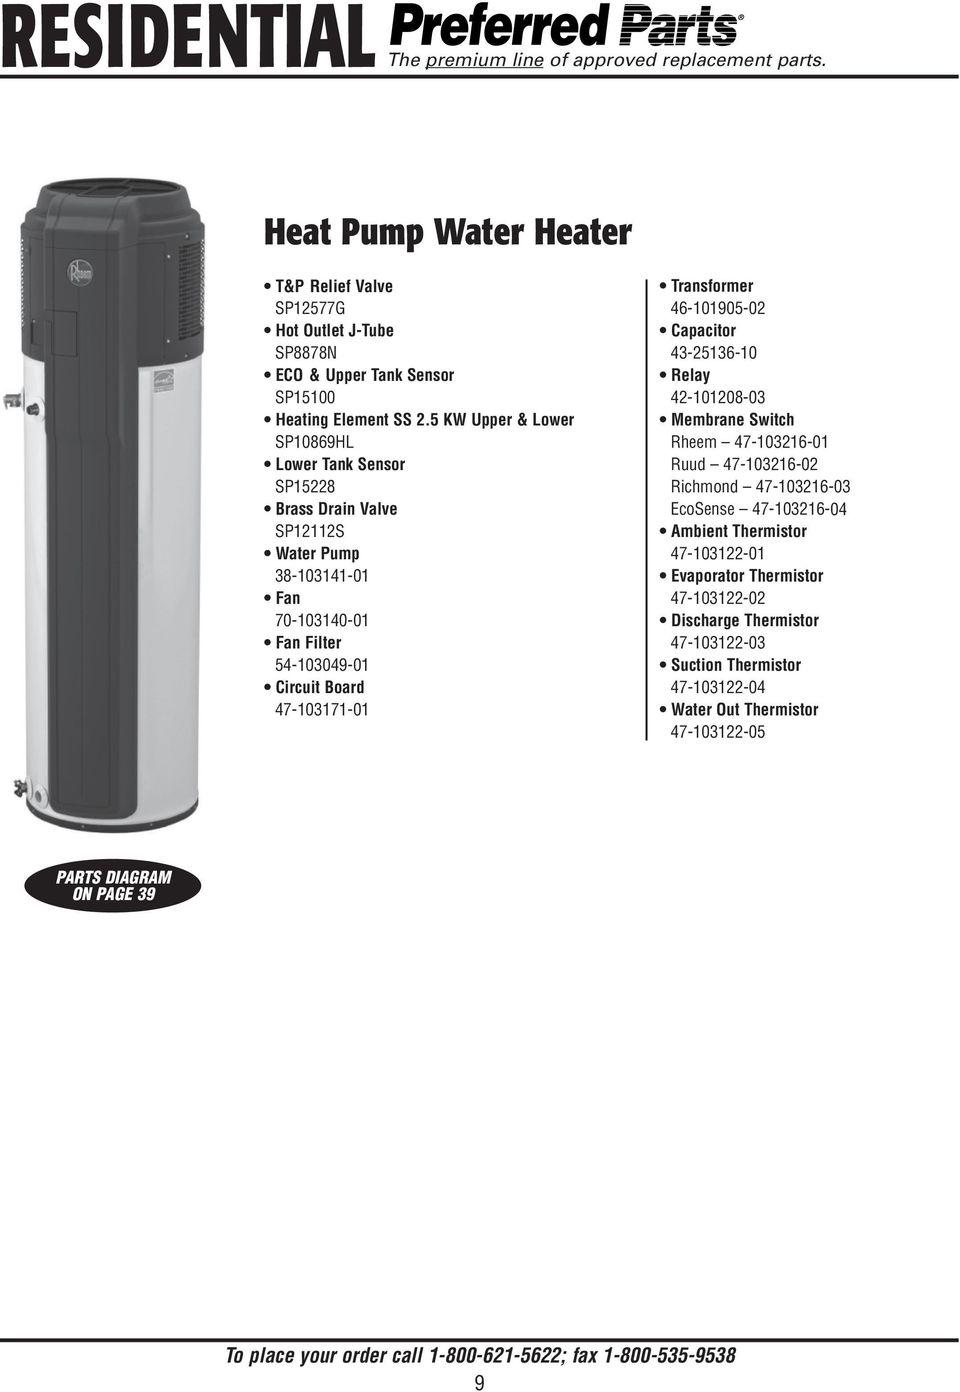 medium resolution of 5 kw upper lower sp10869hl lower tank sensor sp15228 brass drain valve sp12112s water pump